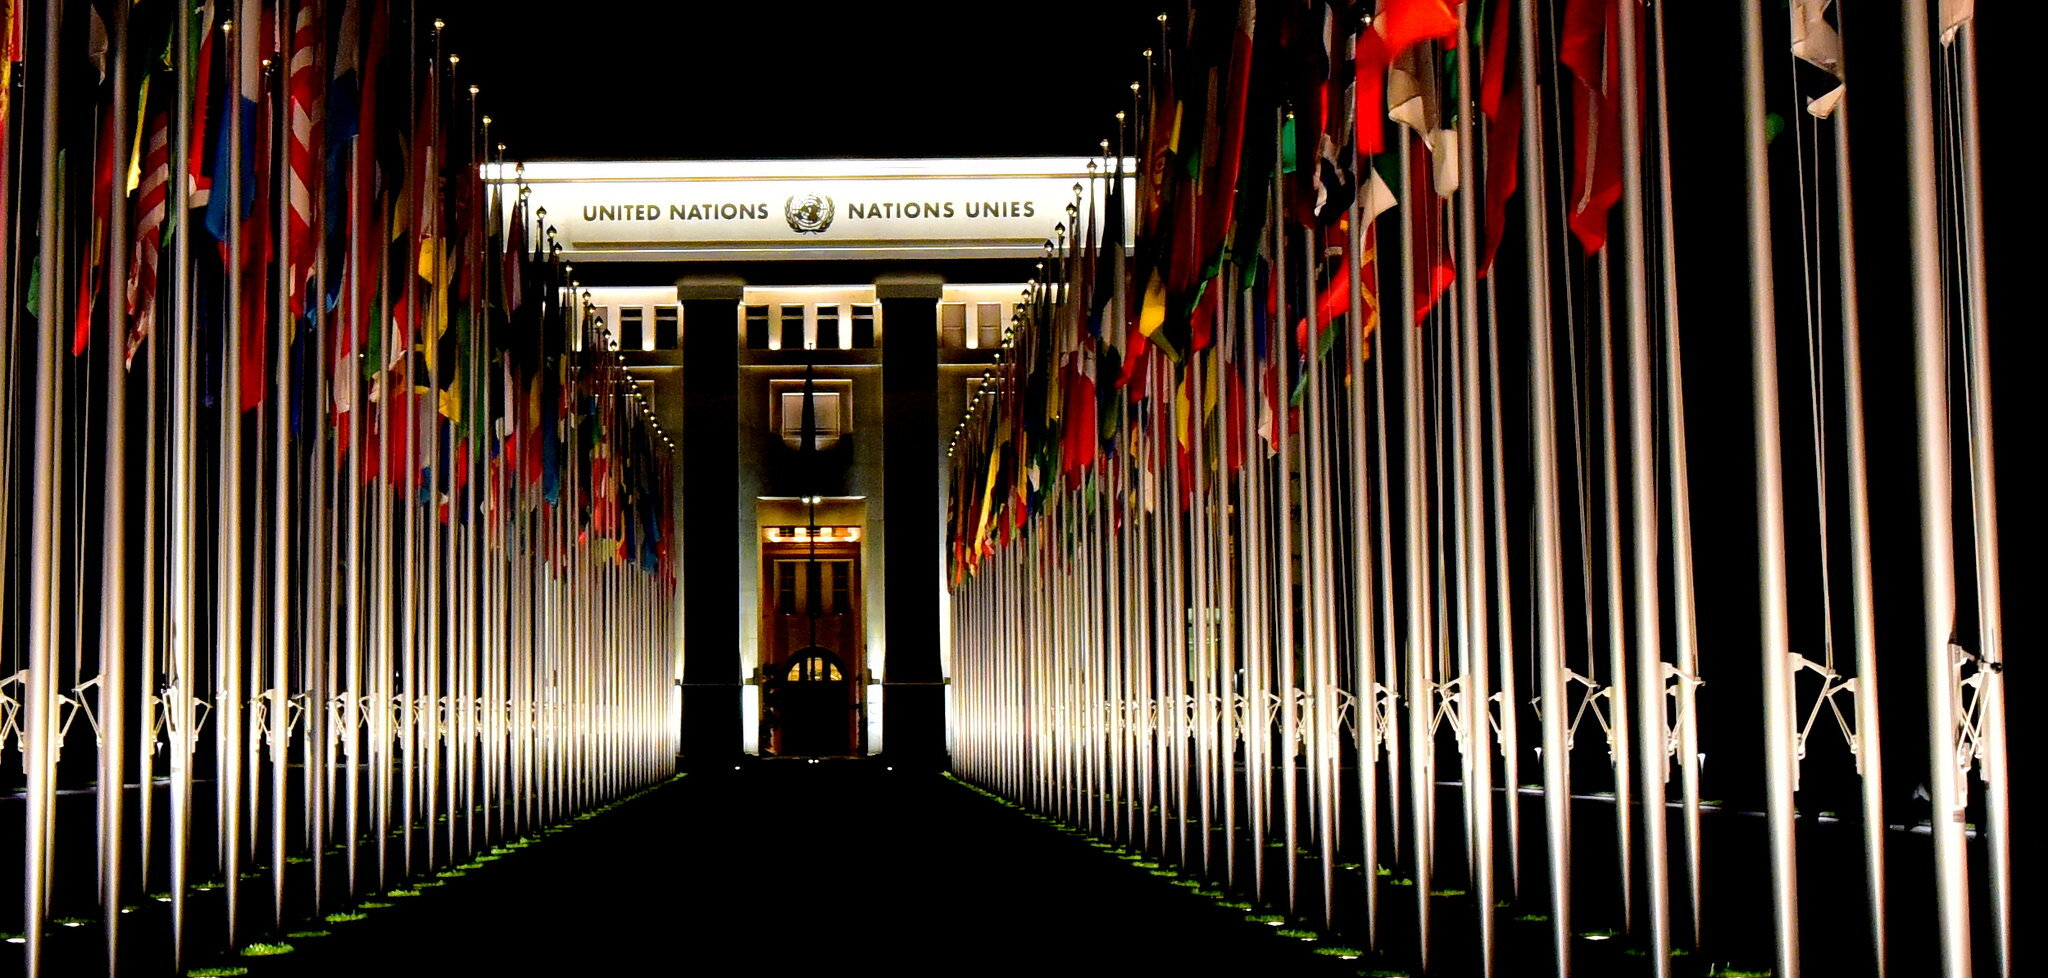 UN Photo-Pontus Wallsten